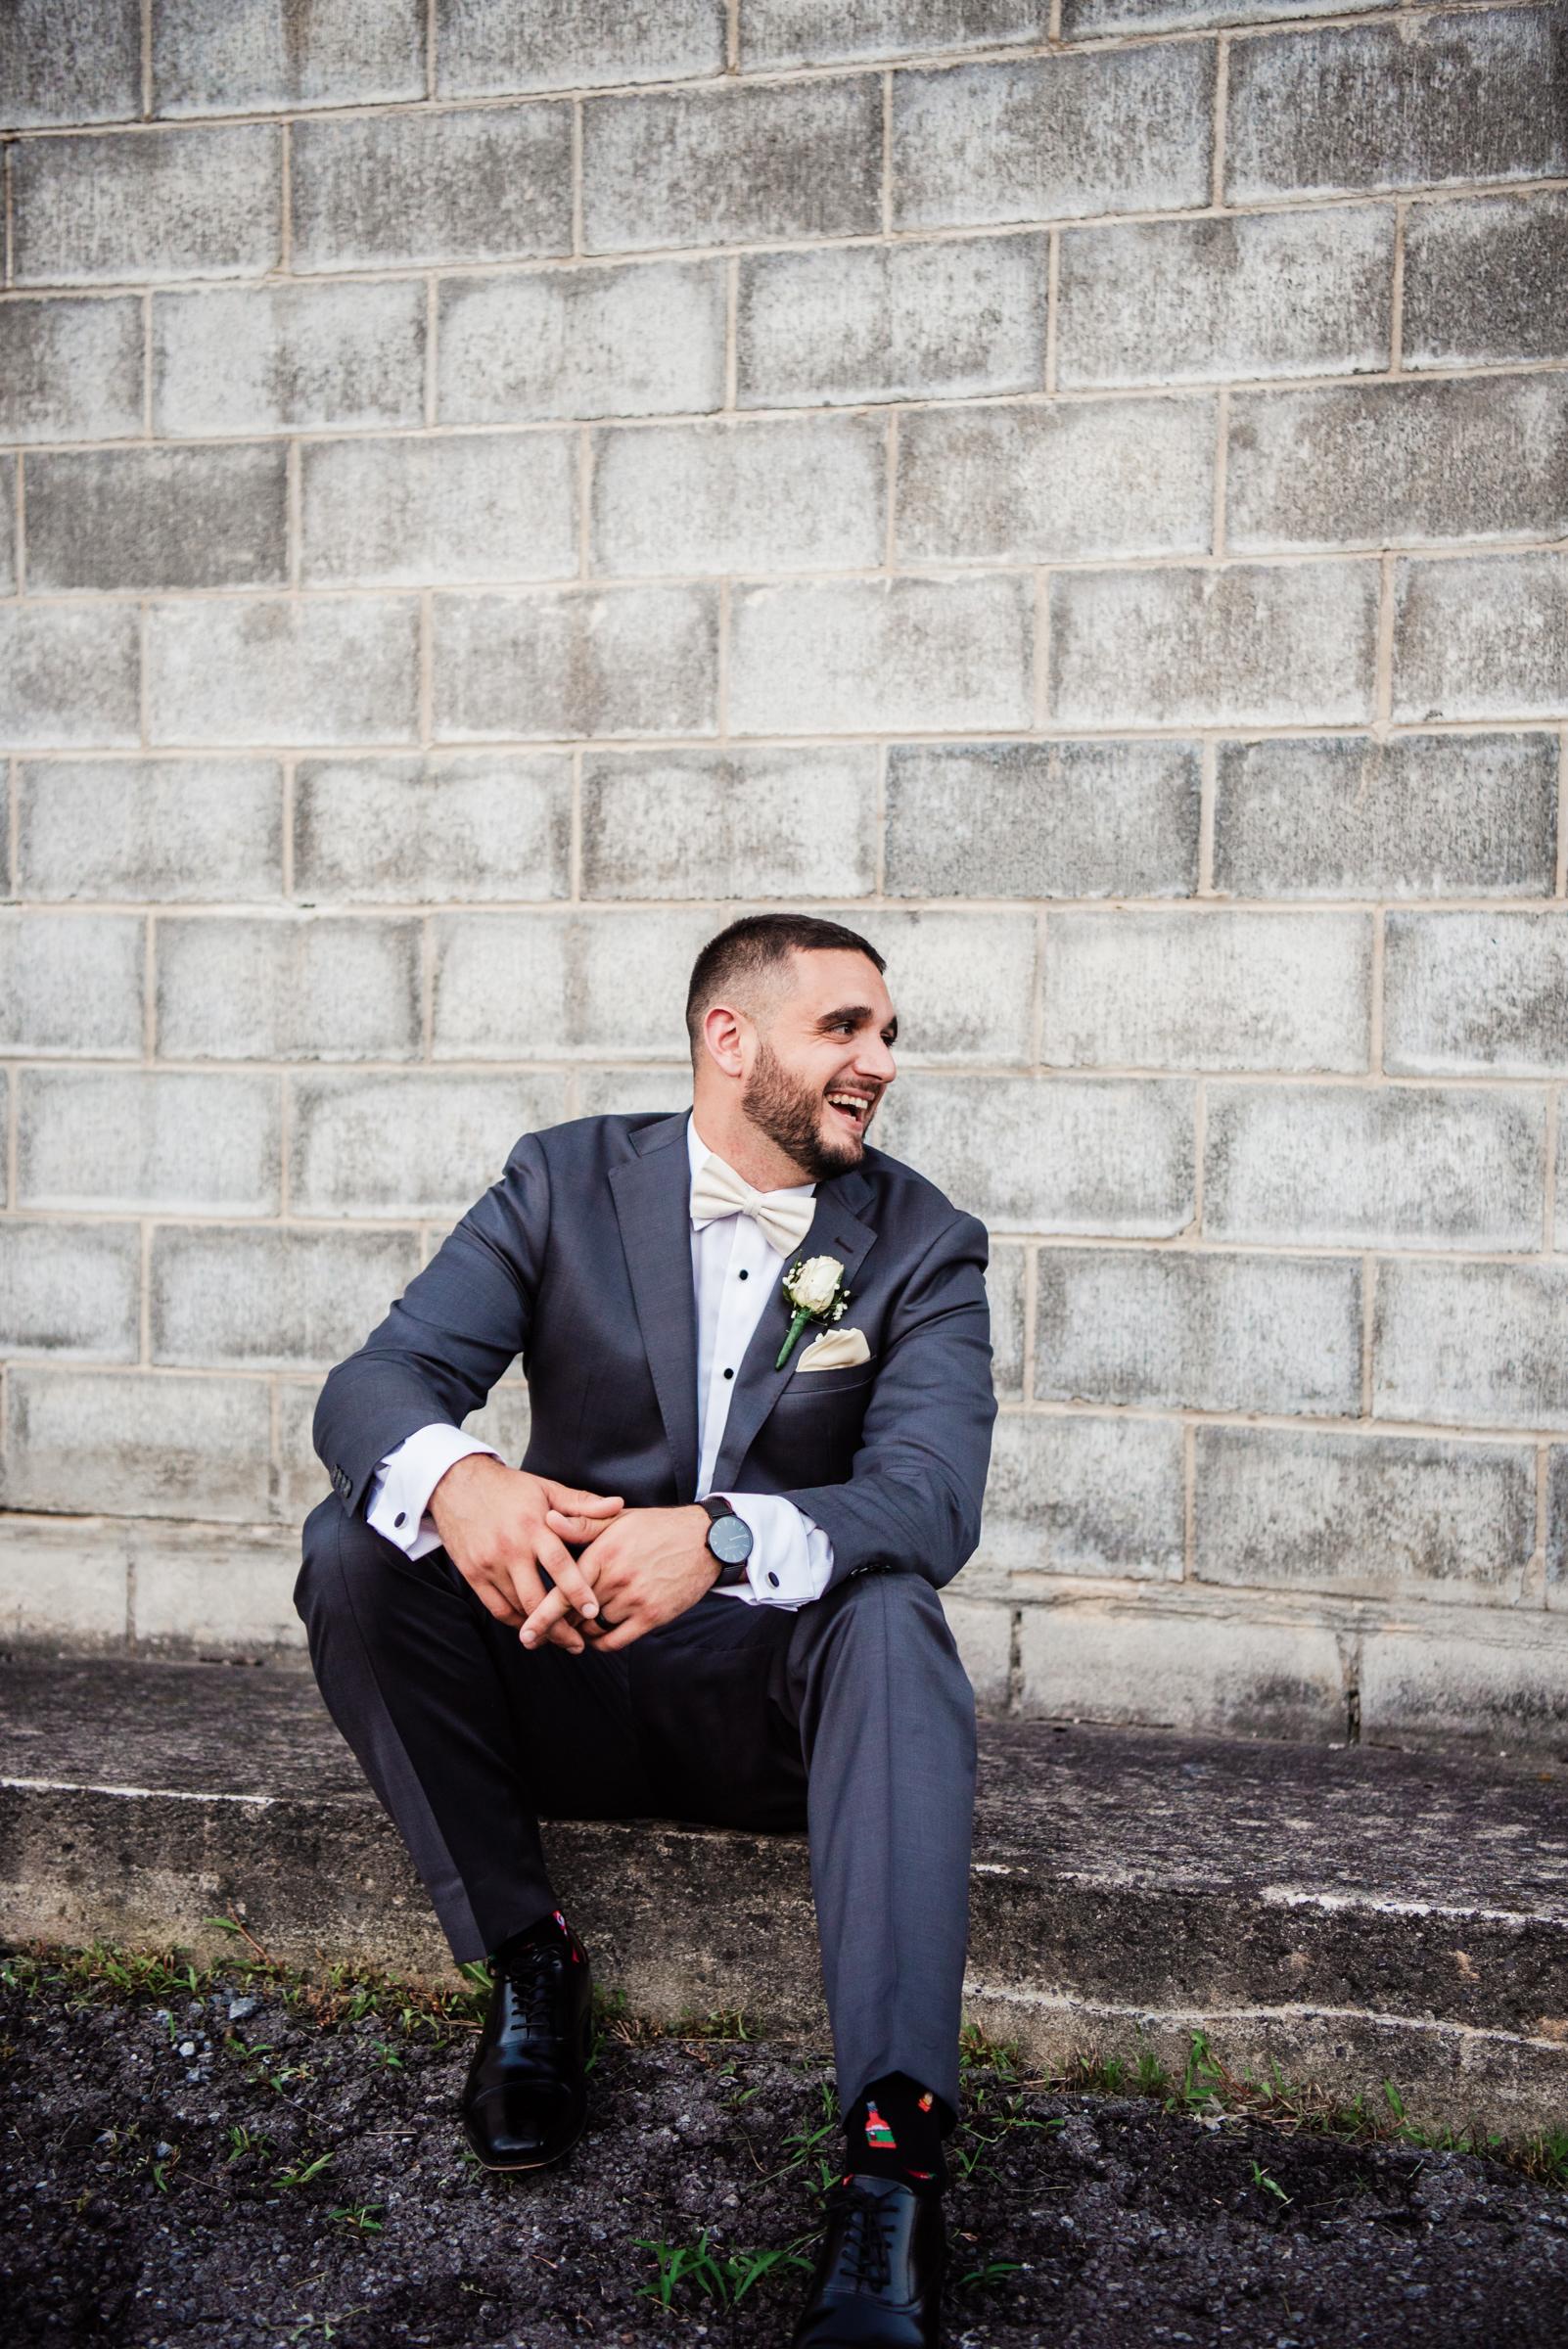 Historic_Old_St_Johns_Church_Valentinos_Banquet_Hall_Central_NY_Wedding_JILL_STUDIO_Rochester_NY_Photographer_DSC_7014.jpg